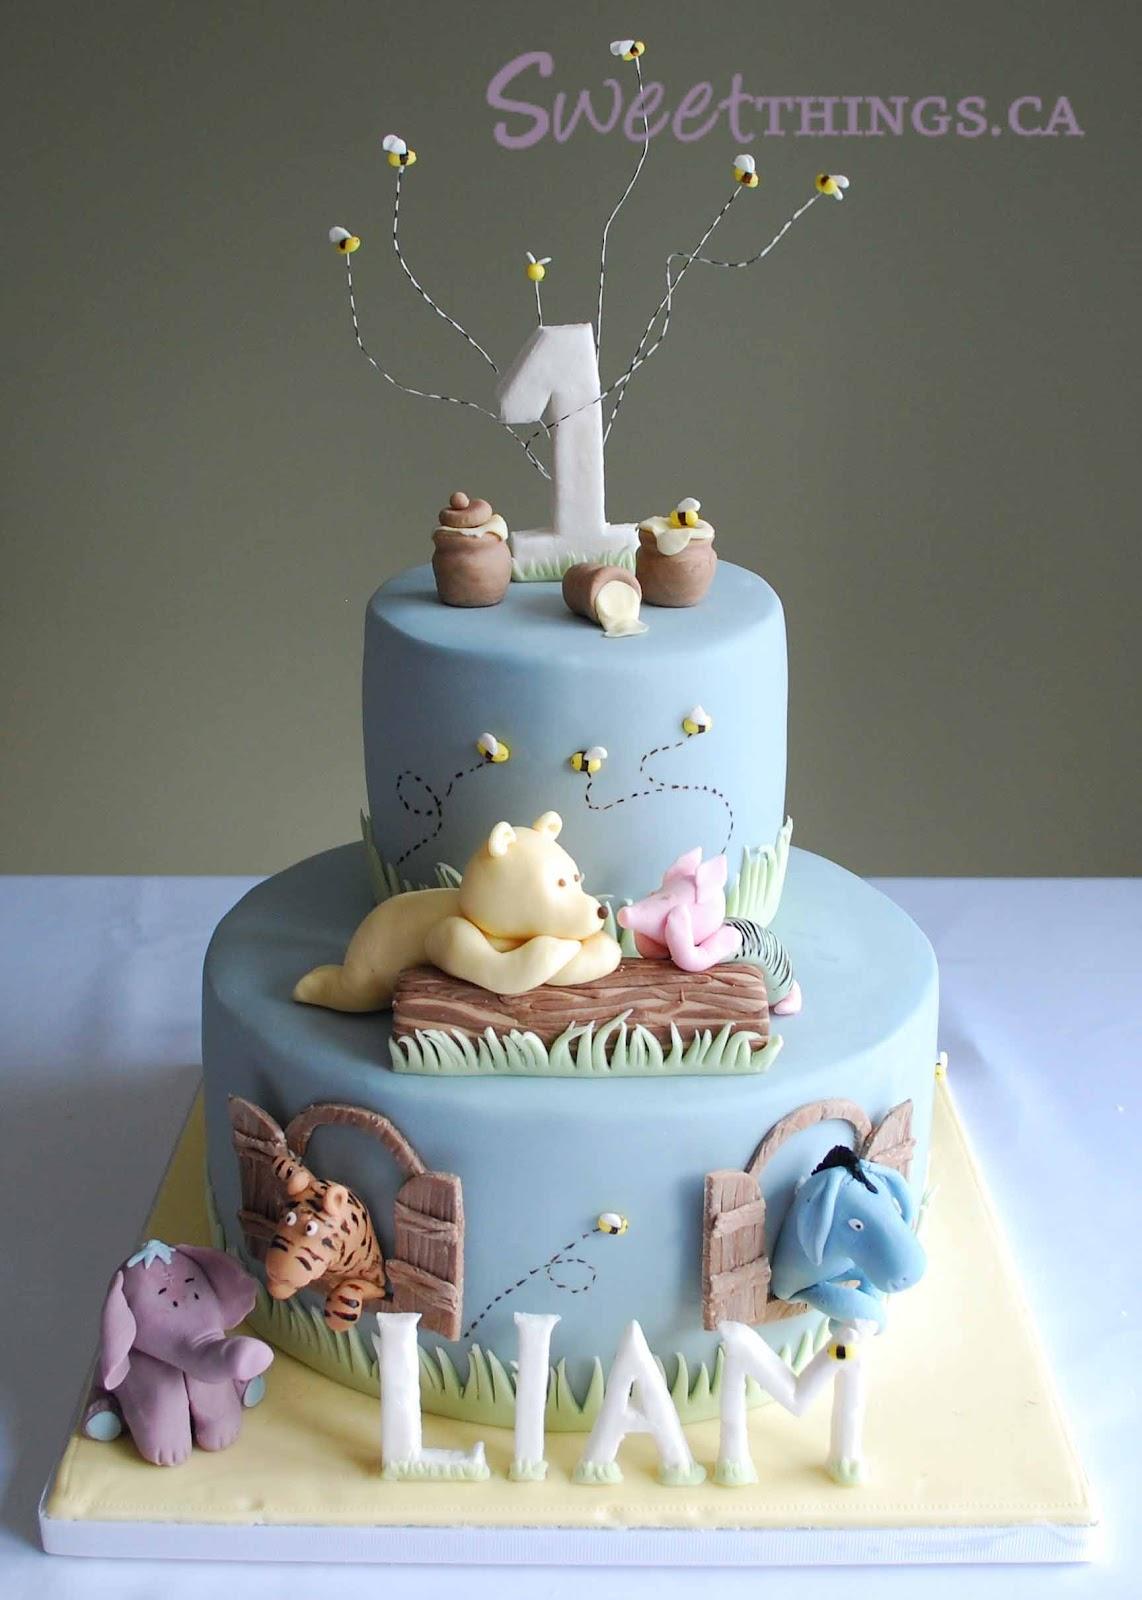 Sweetthings 1st Birthday Classic Winnie The Pooh Cake